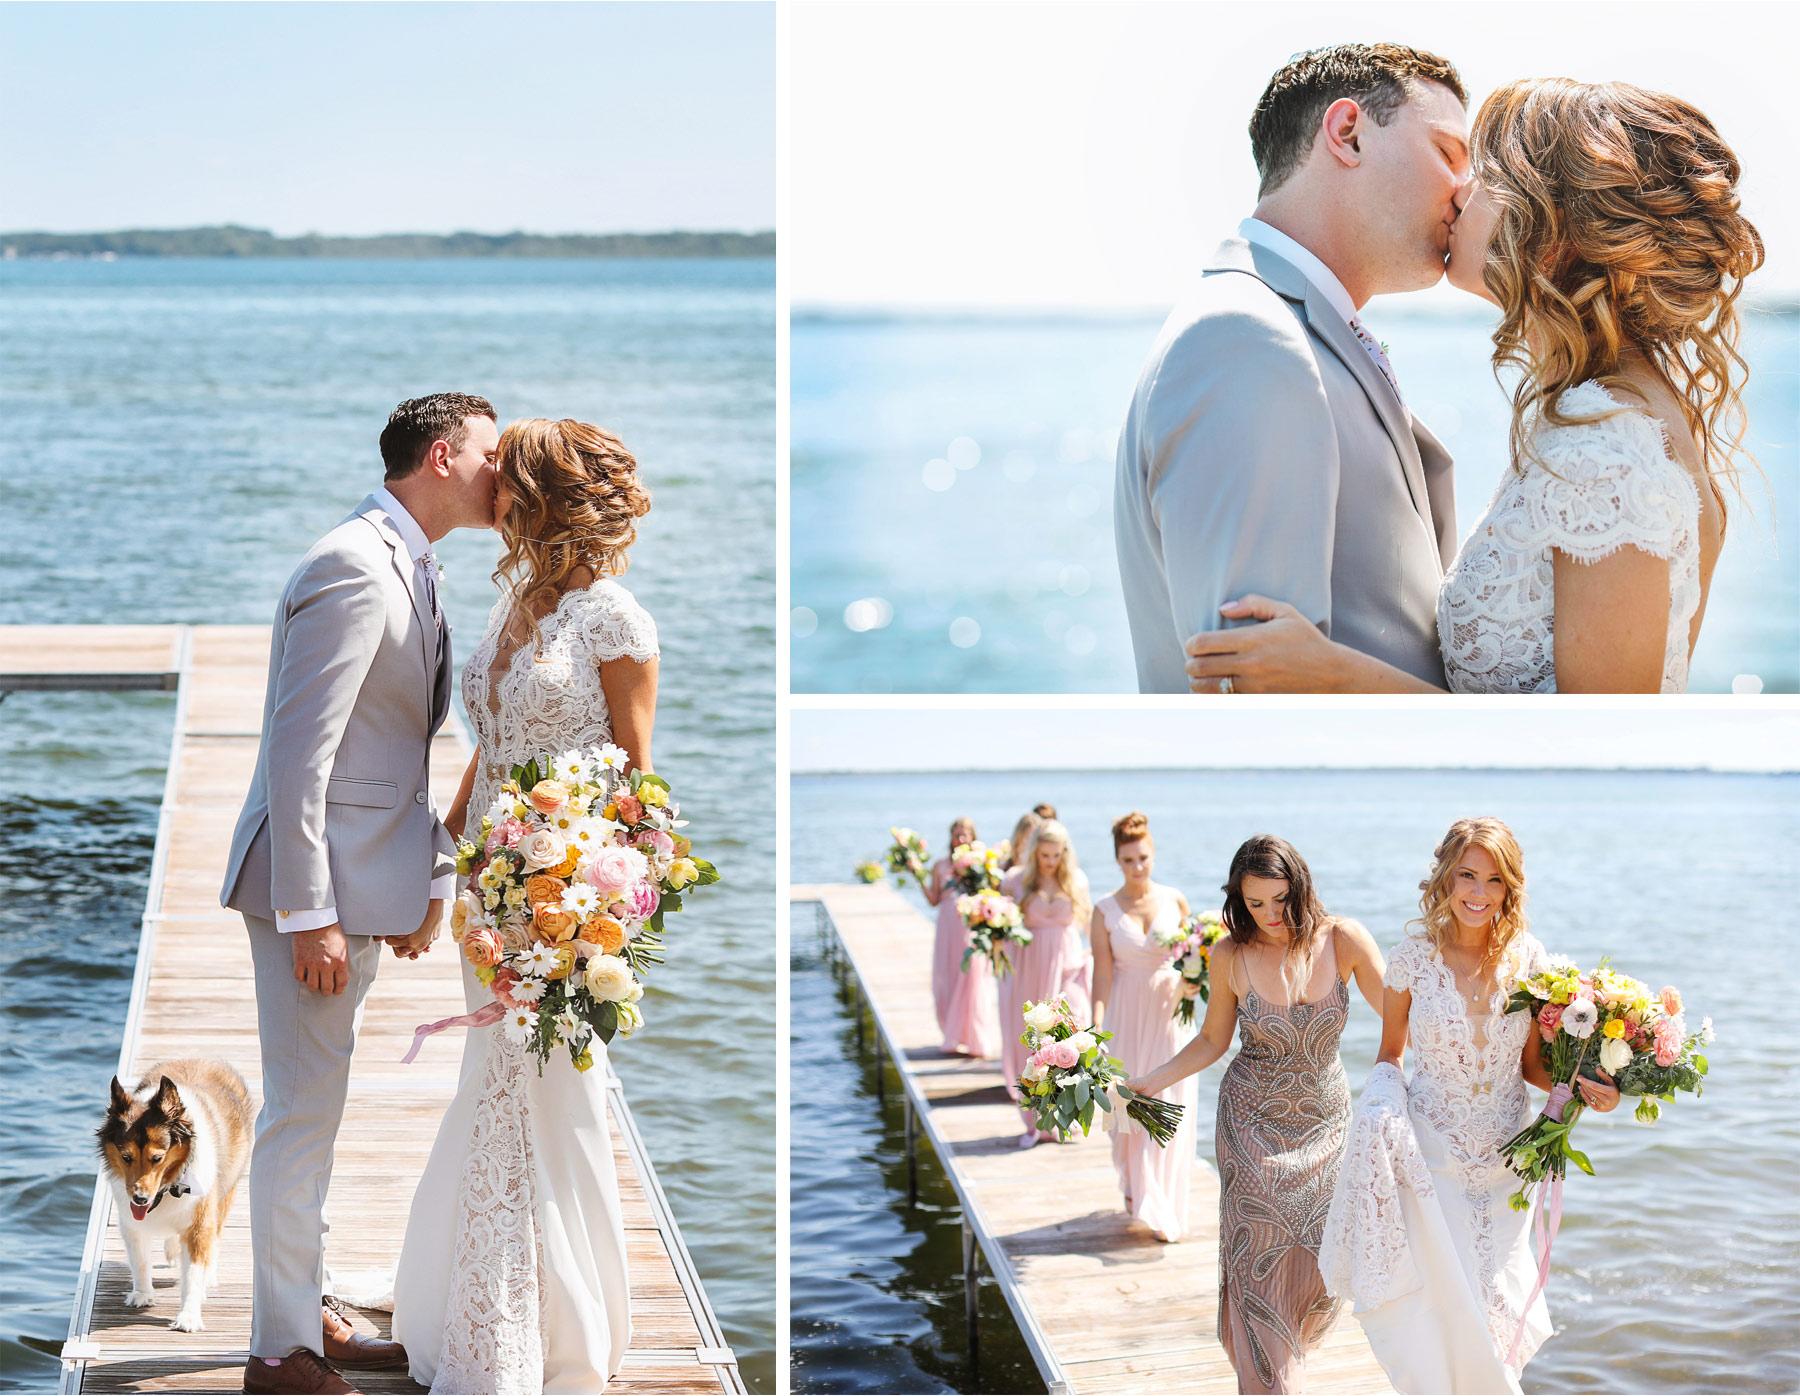 07-Vick-Photography-Wedding-Ottertail-Minnesota-Alice-in-Wonderland-Theme-First-Look-Bride-Groom-Lake-Dock-Bridesmaids-Tess-and-Greg.jpg